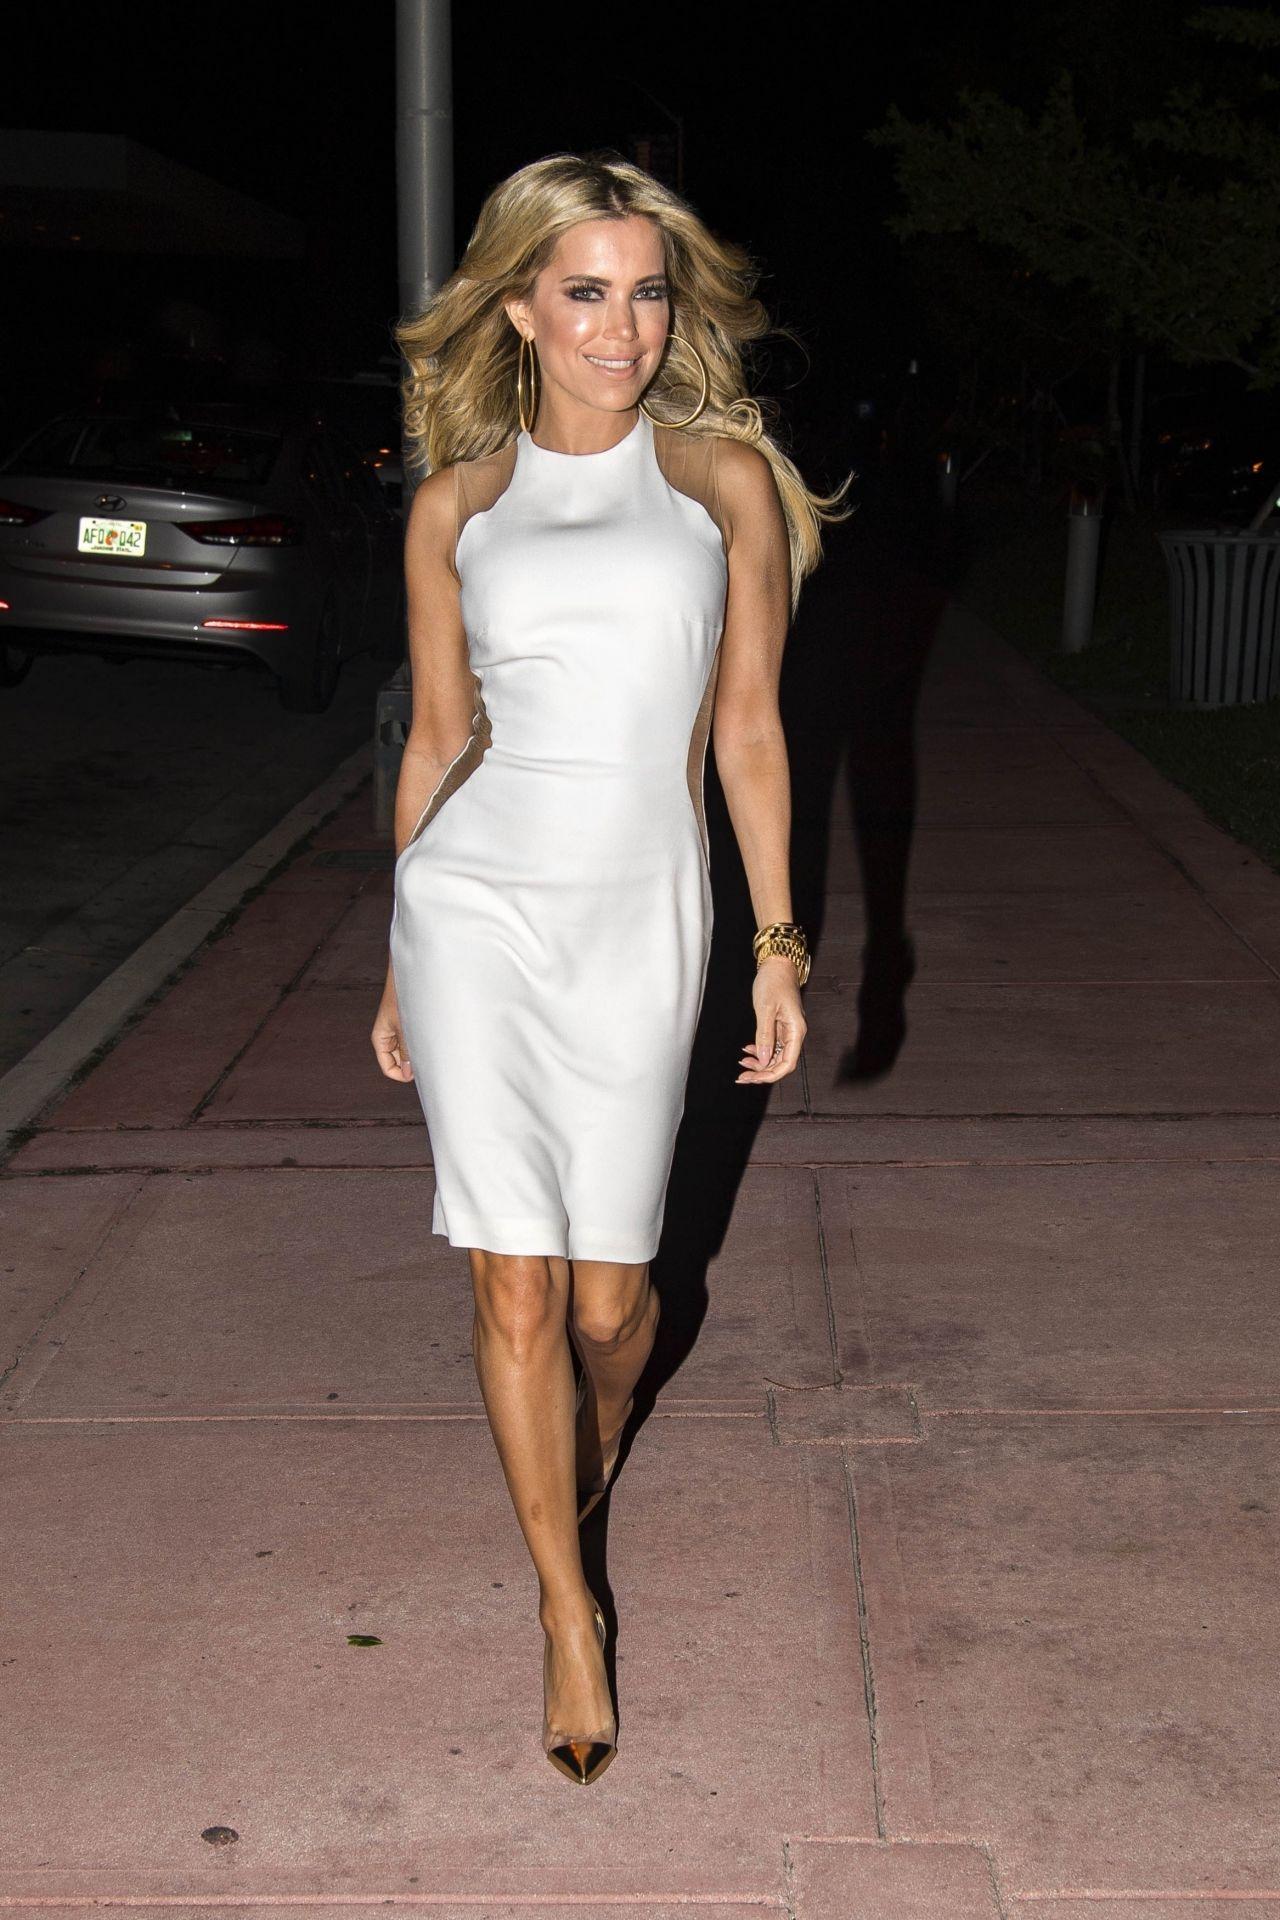 899dd72c80b Sylvie Meis in White Dress Night Out in Miami Beach